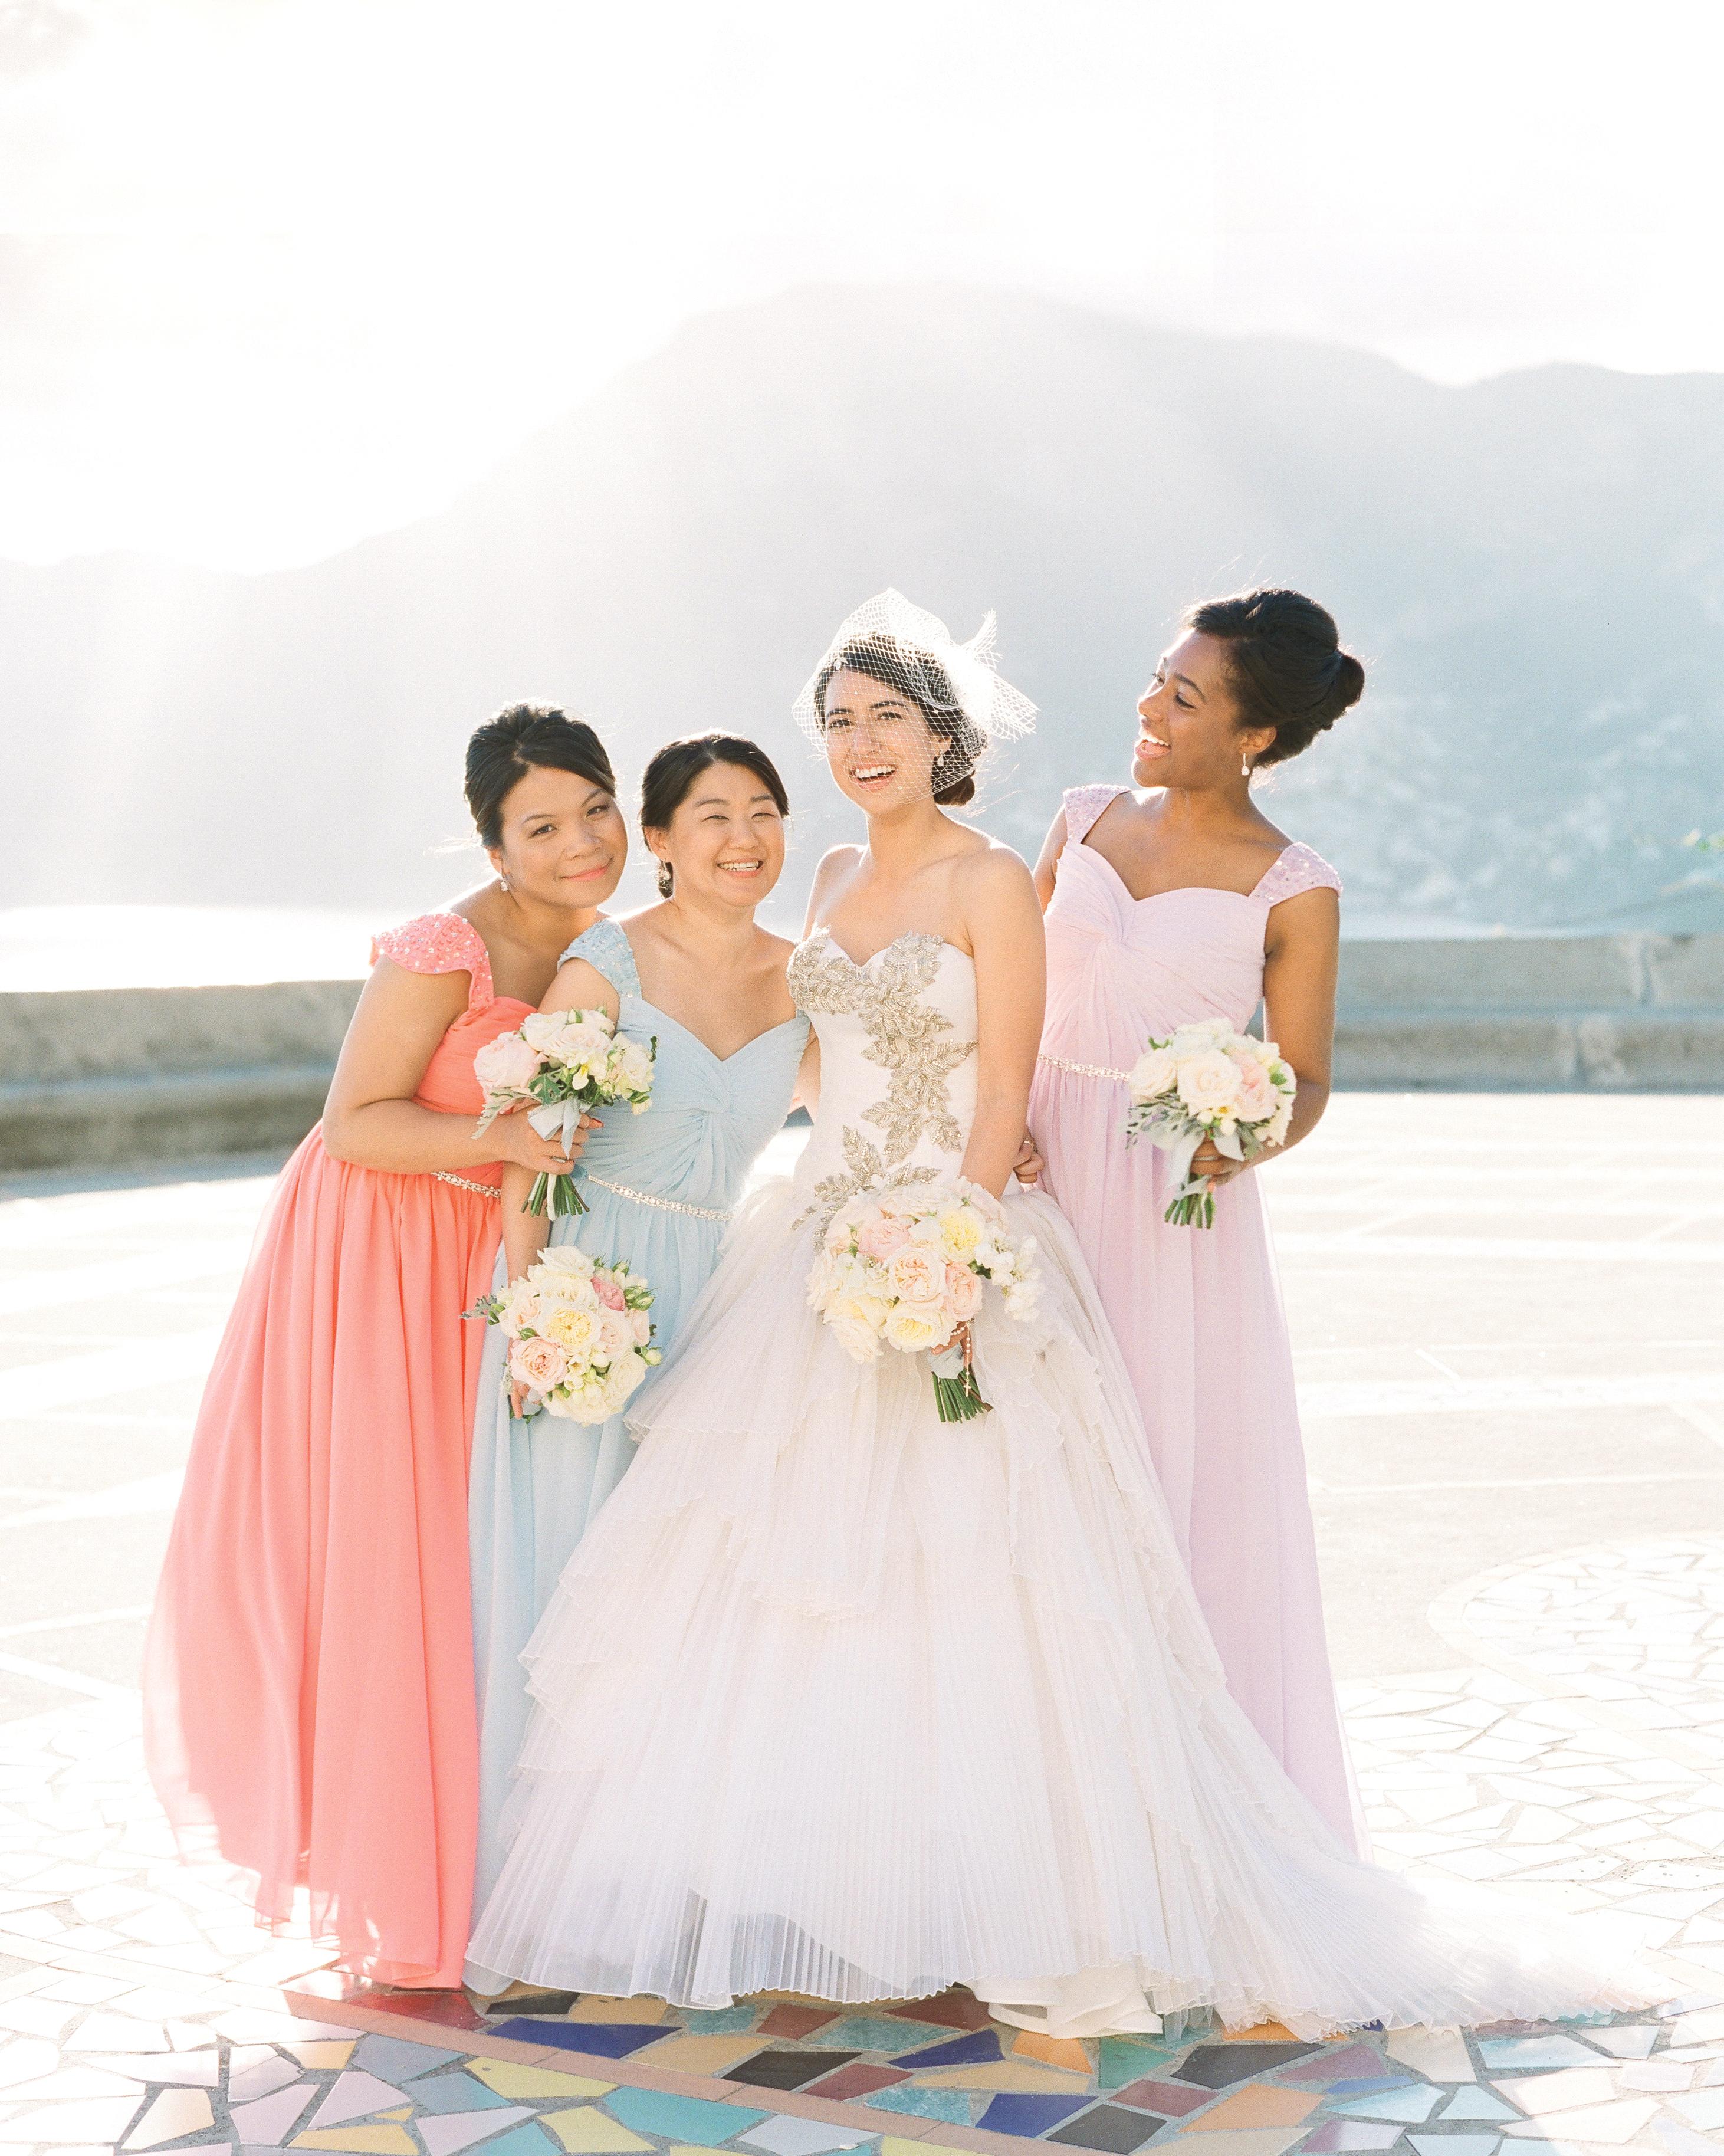 michelle-christopher-positano-bride-bridesmaids-0700-s111681.jpg